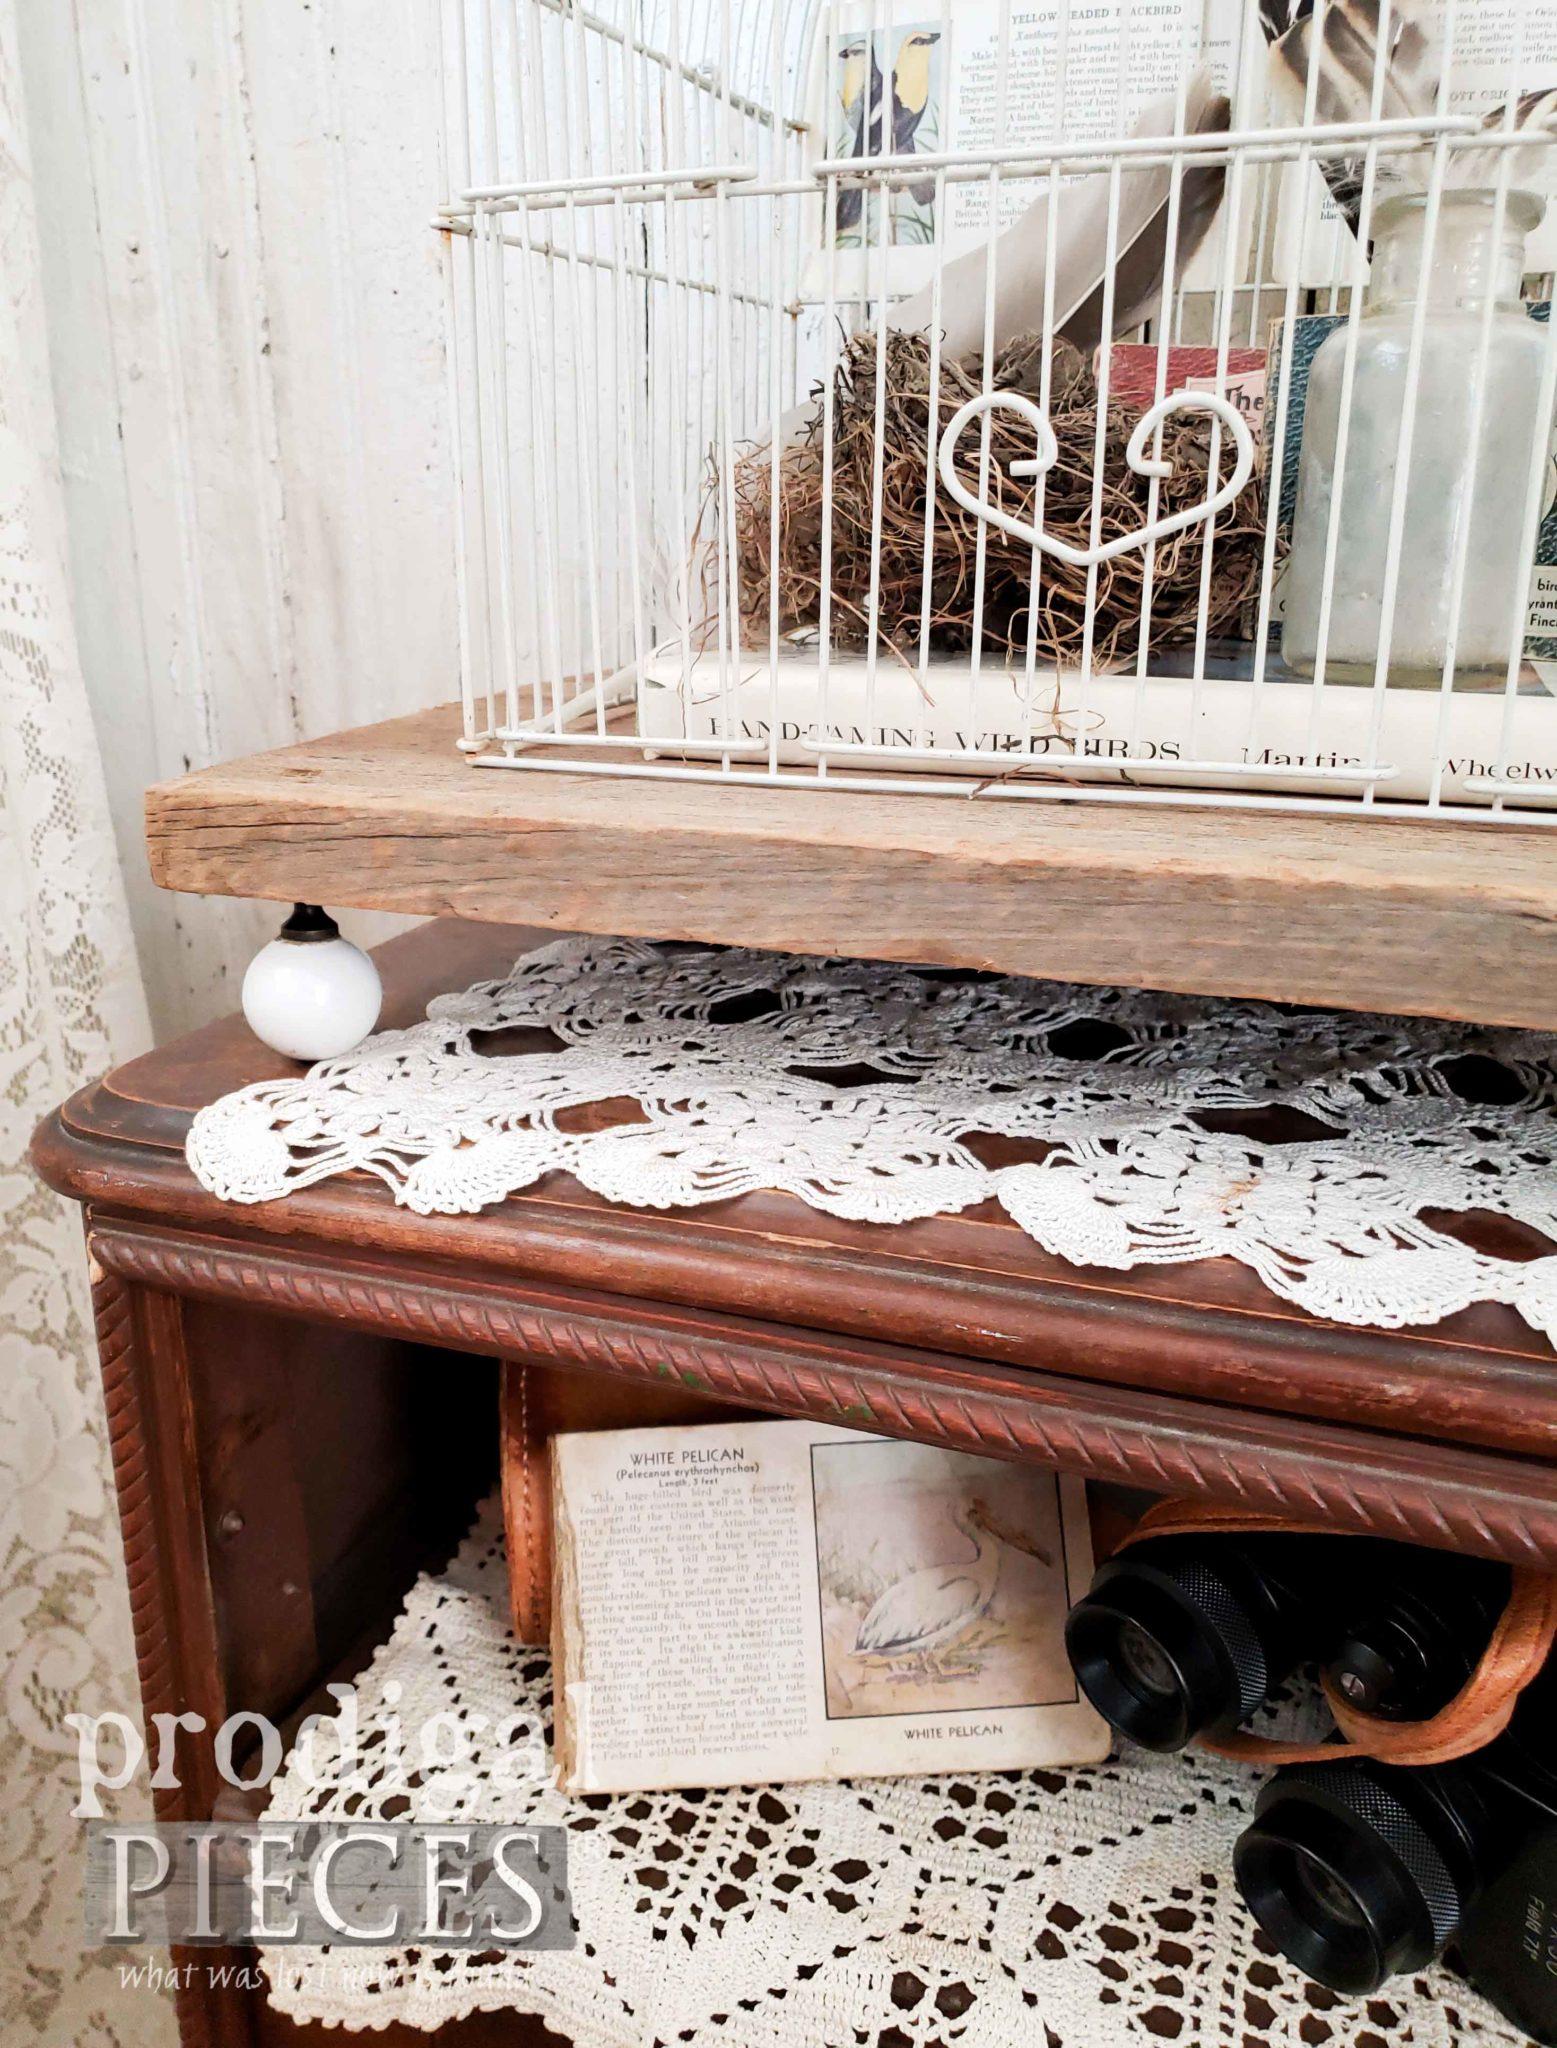 Upcycled Drawer Knobs for Upcycled Bird Cage Farmhouse Decor | prodigalpieces.com #prodigalpieces #diy #farmhouse #homedecor